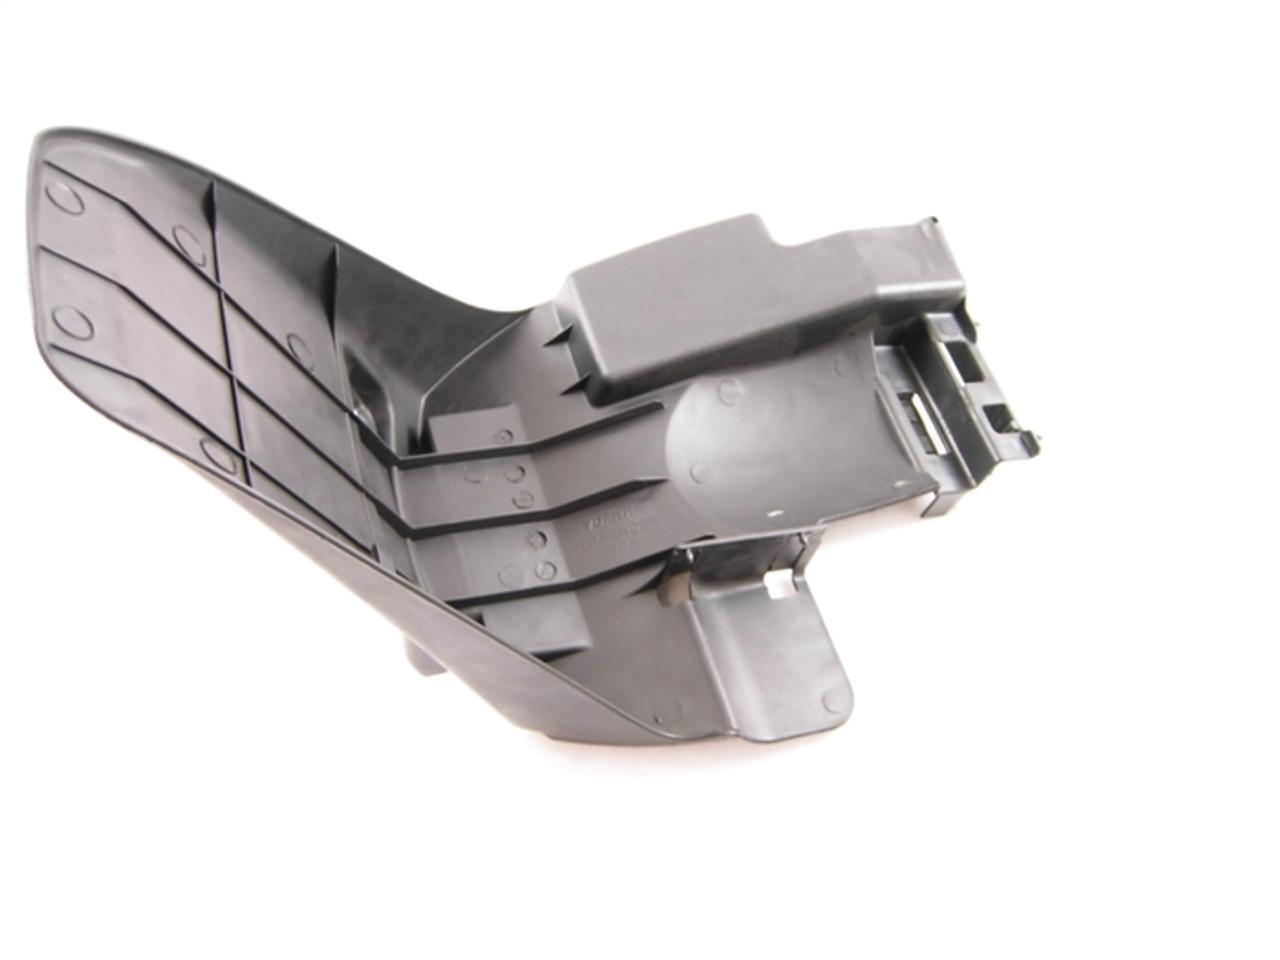 fender (rear wheel)/splash 11964-a110-2